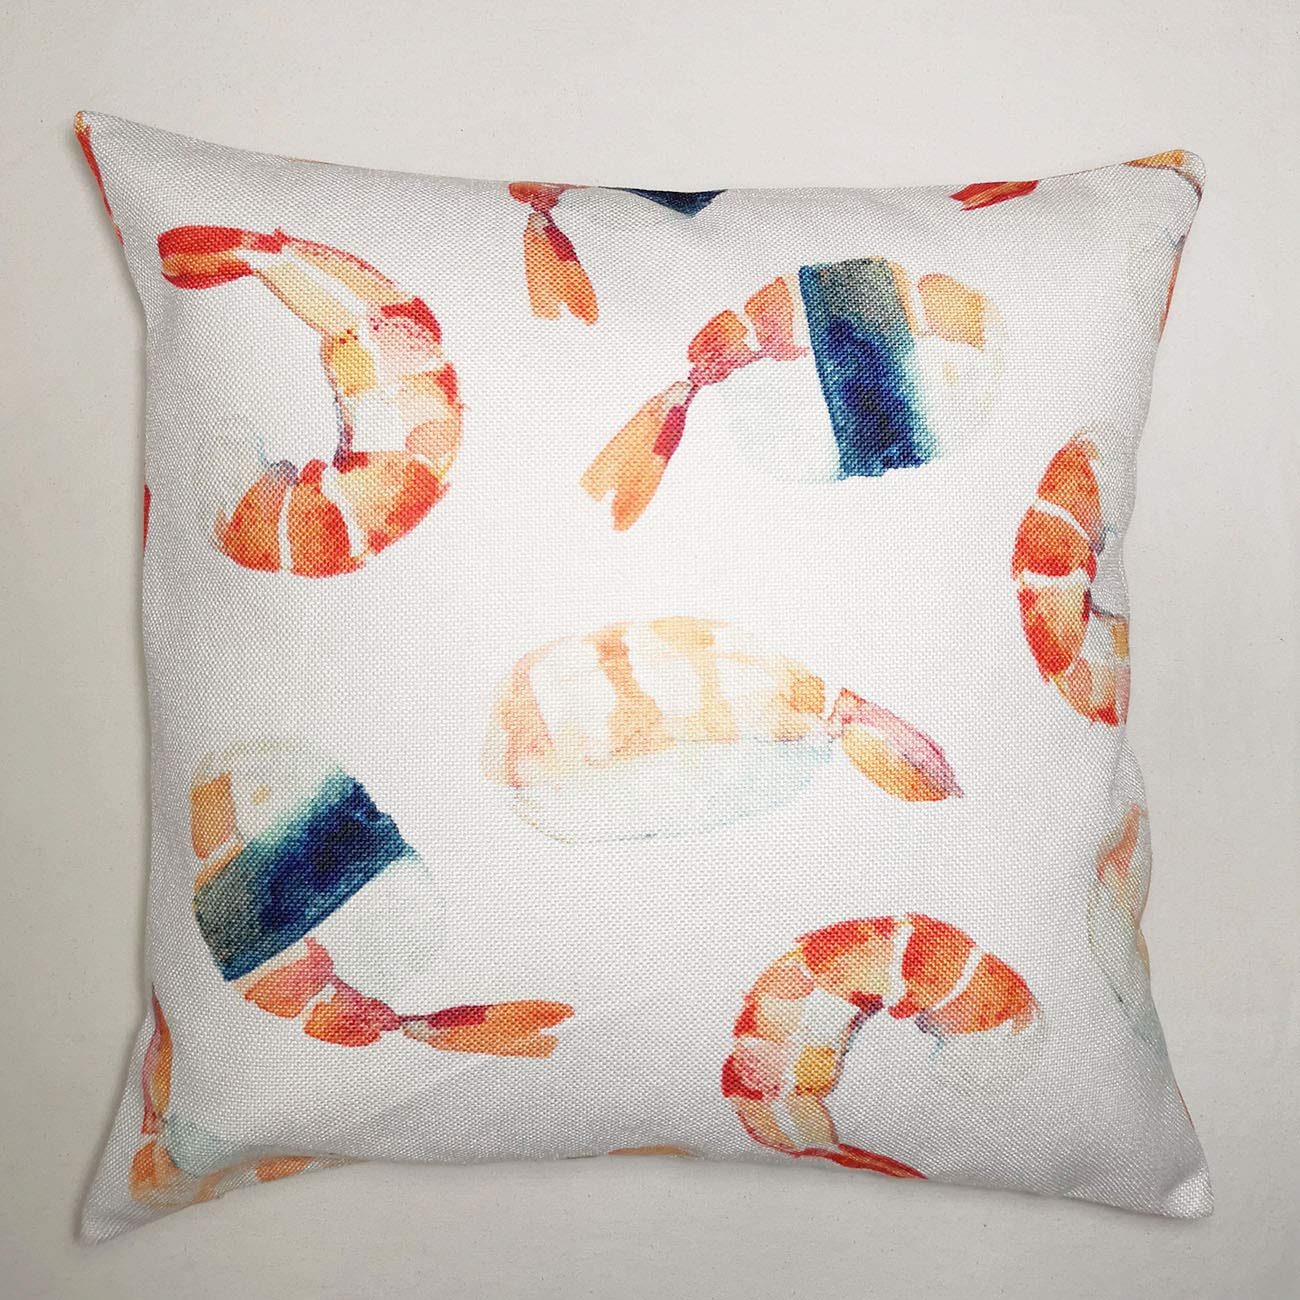 Turnip Design Watercolor Shrimp Sushi Home Decor Wedding Housewarming Gift Cotton Cushion Cover Throw Pillow Case TDPN26